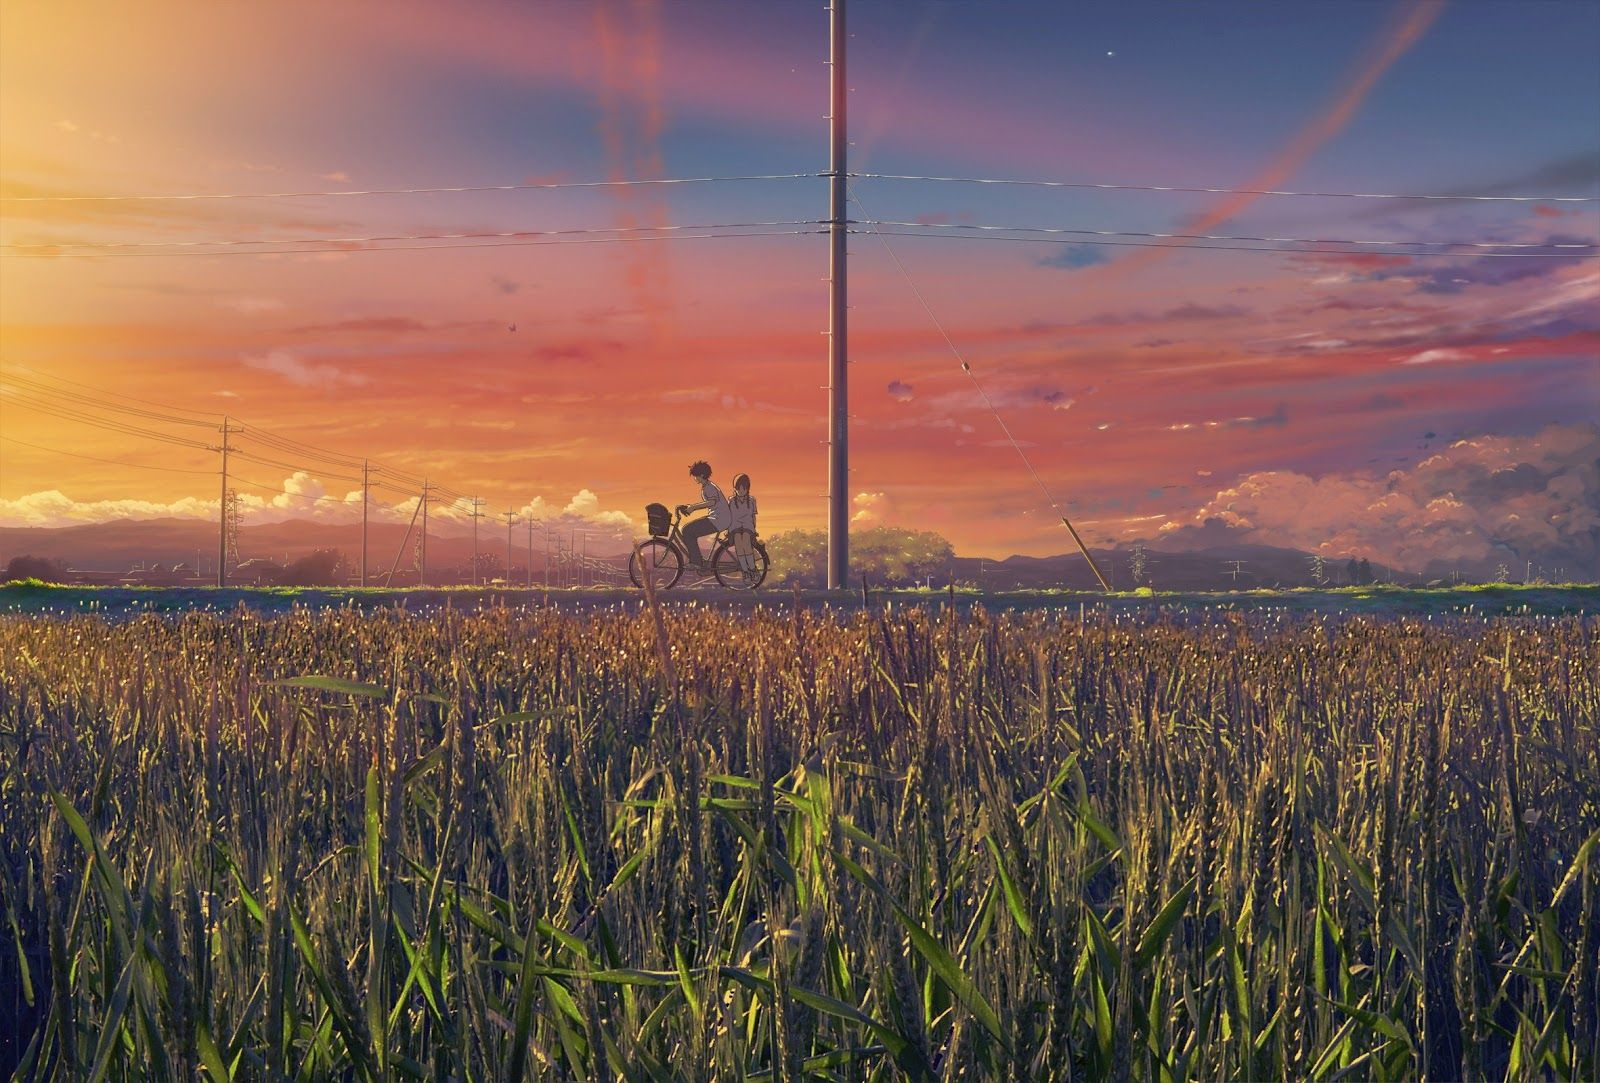 Anime ภาพพ นหล ง Anime การ ต น สวยๆ Anime Wallpaper Live Anime Scenery Landscape Background Images